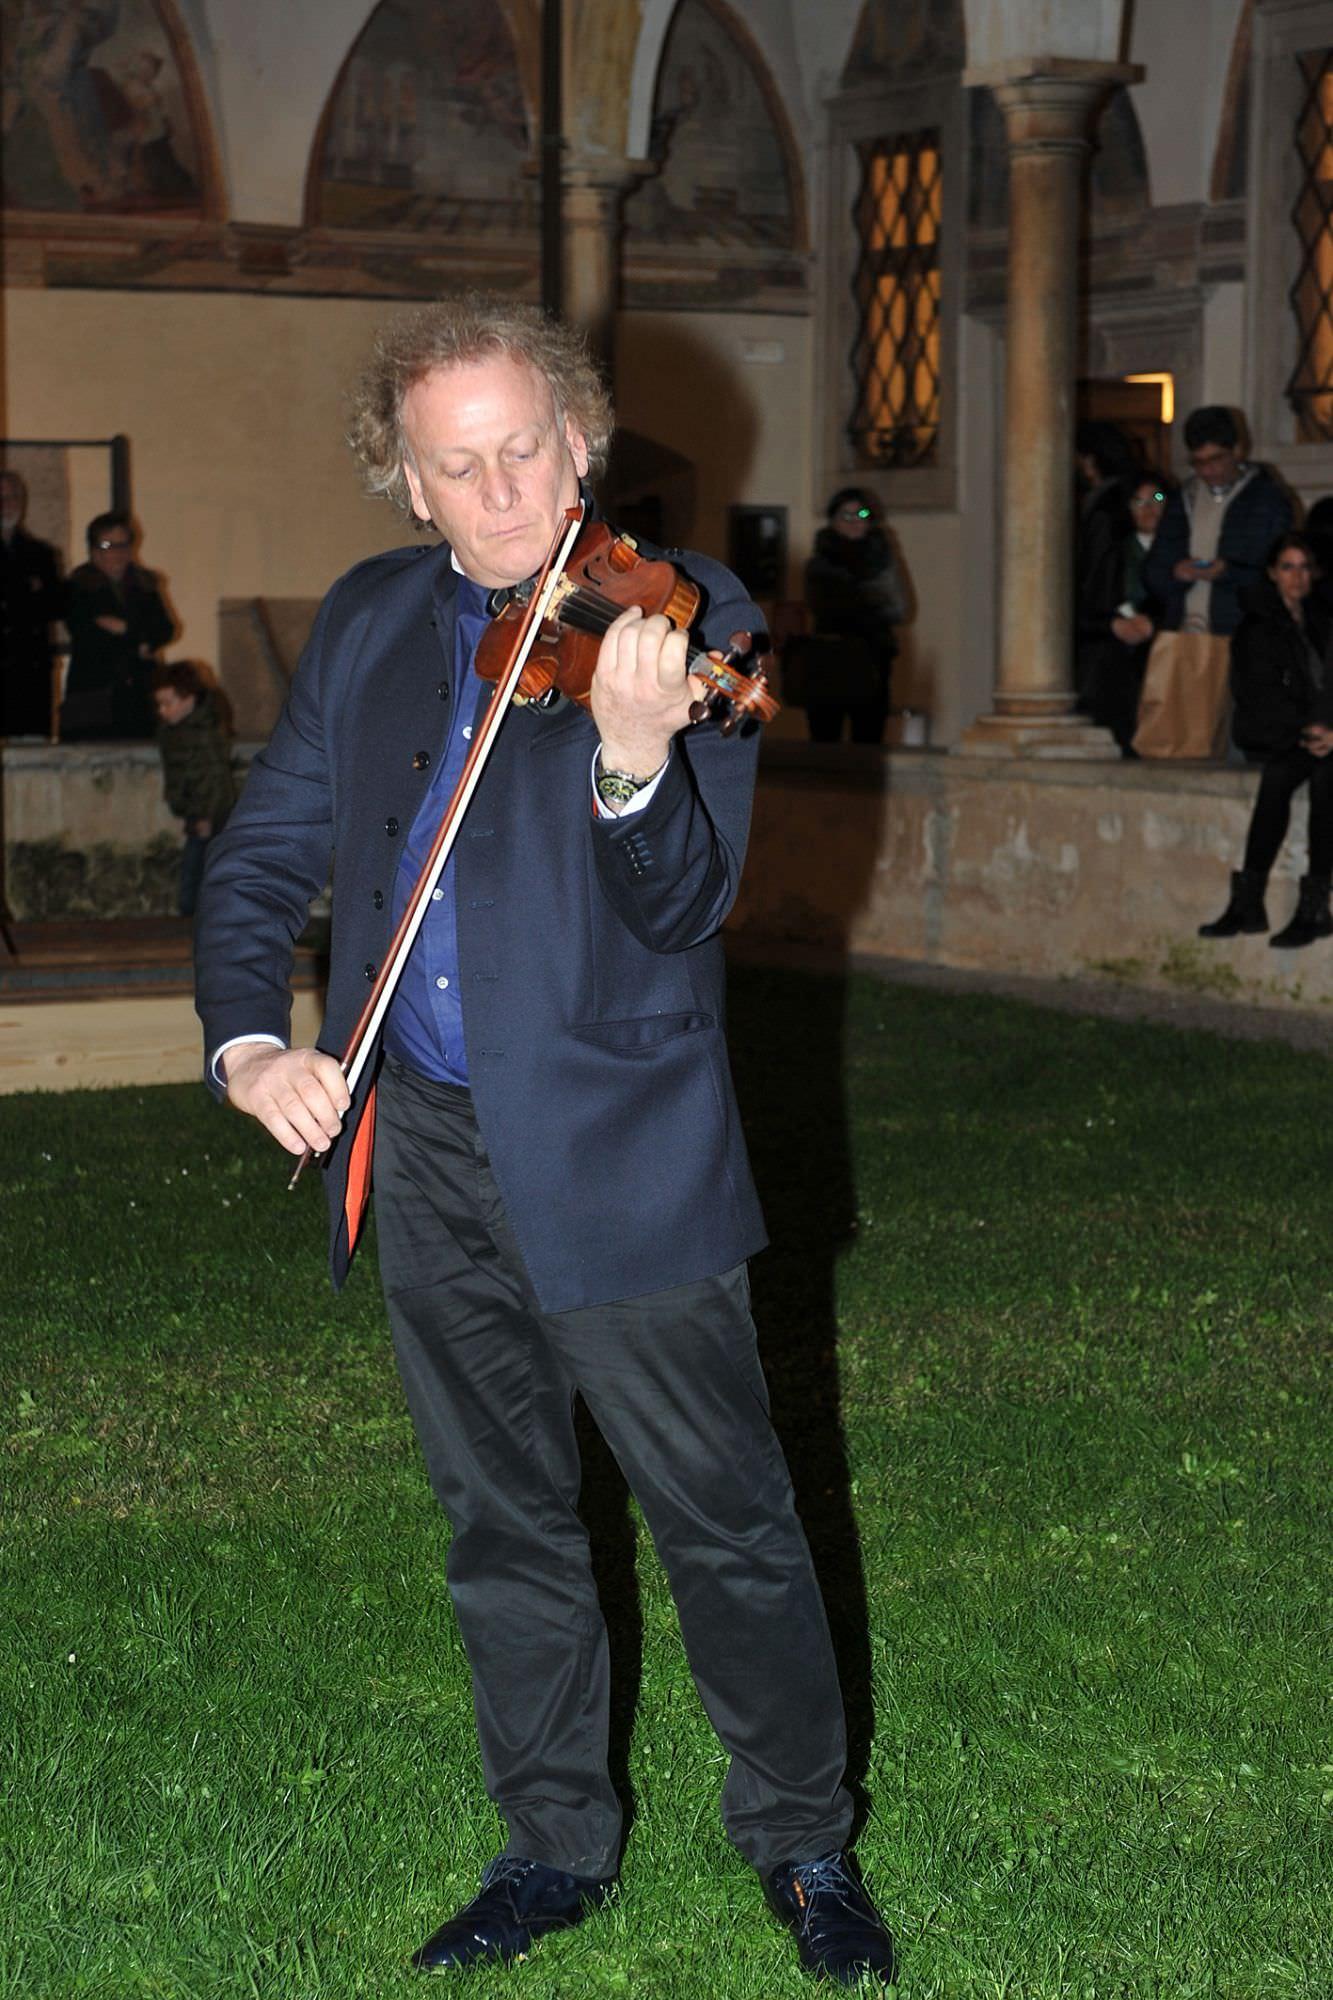 Michael Guttman, nuovo cittadino onorario di Pietrasanta